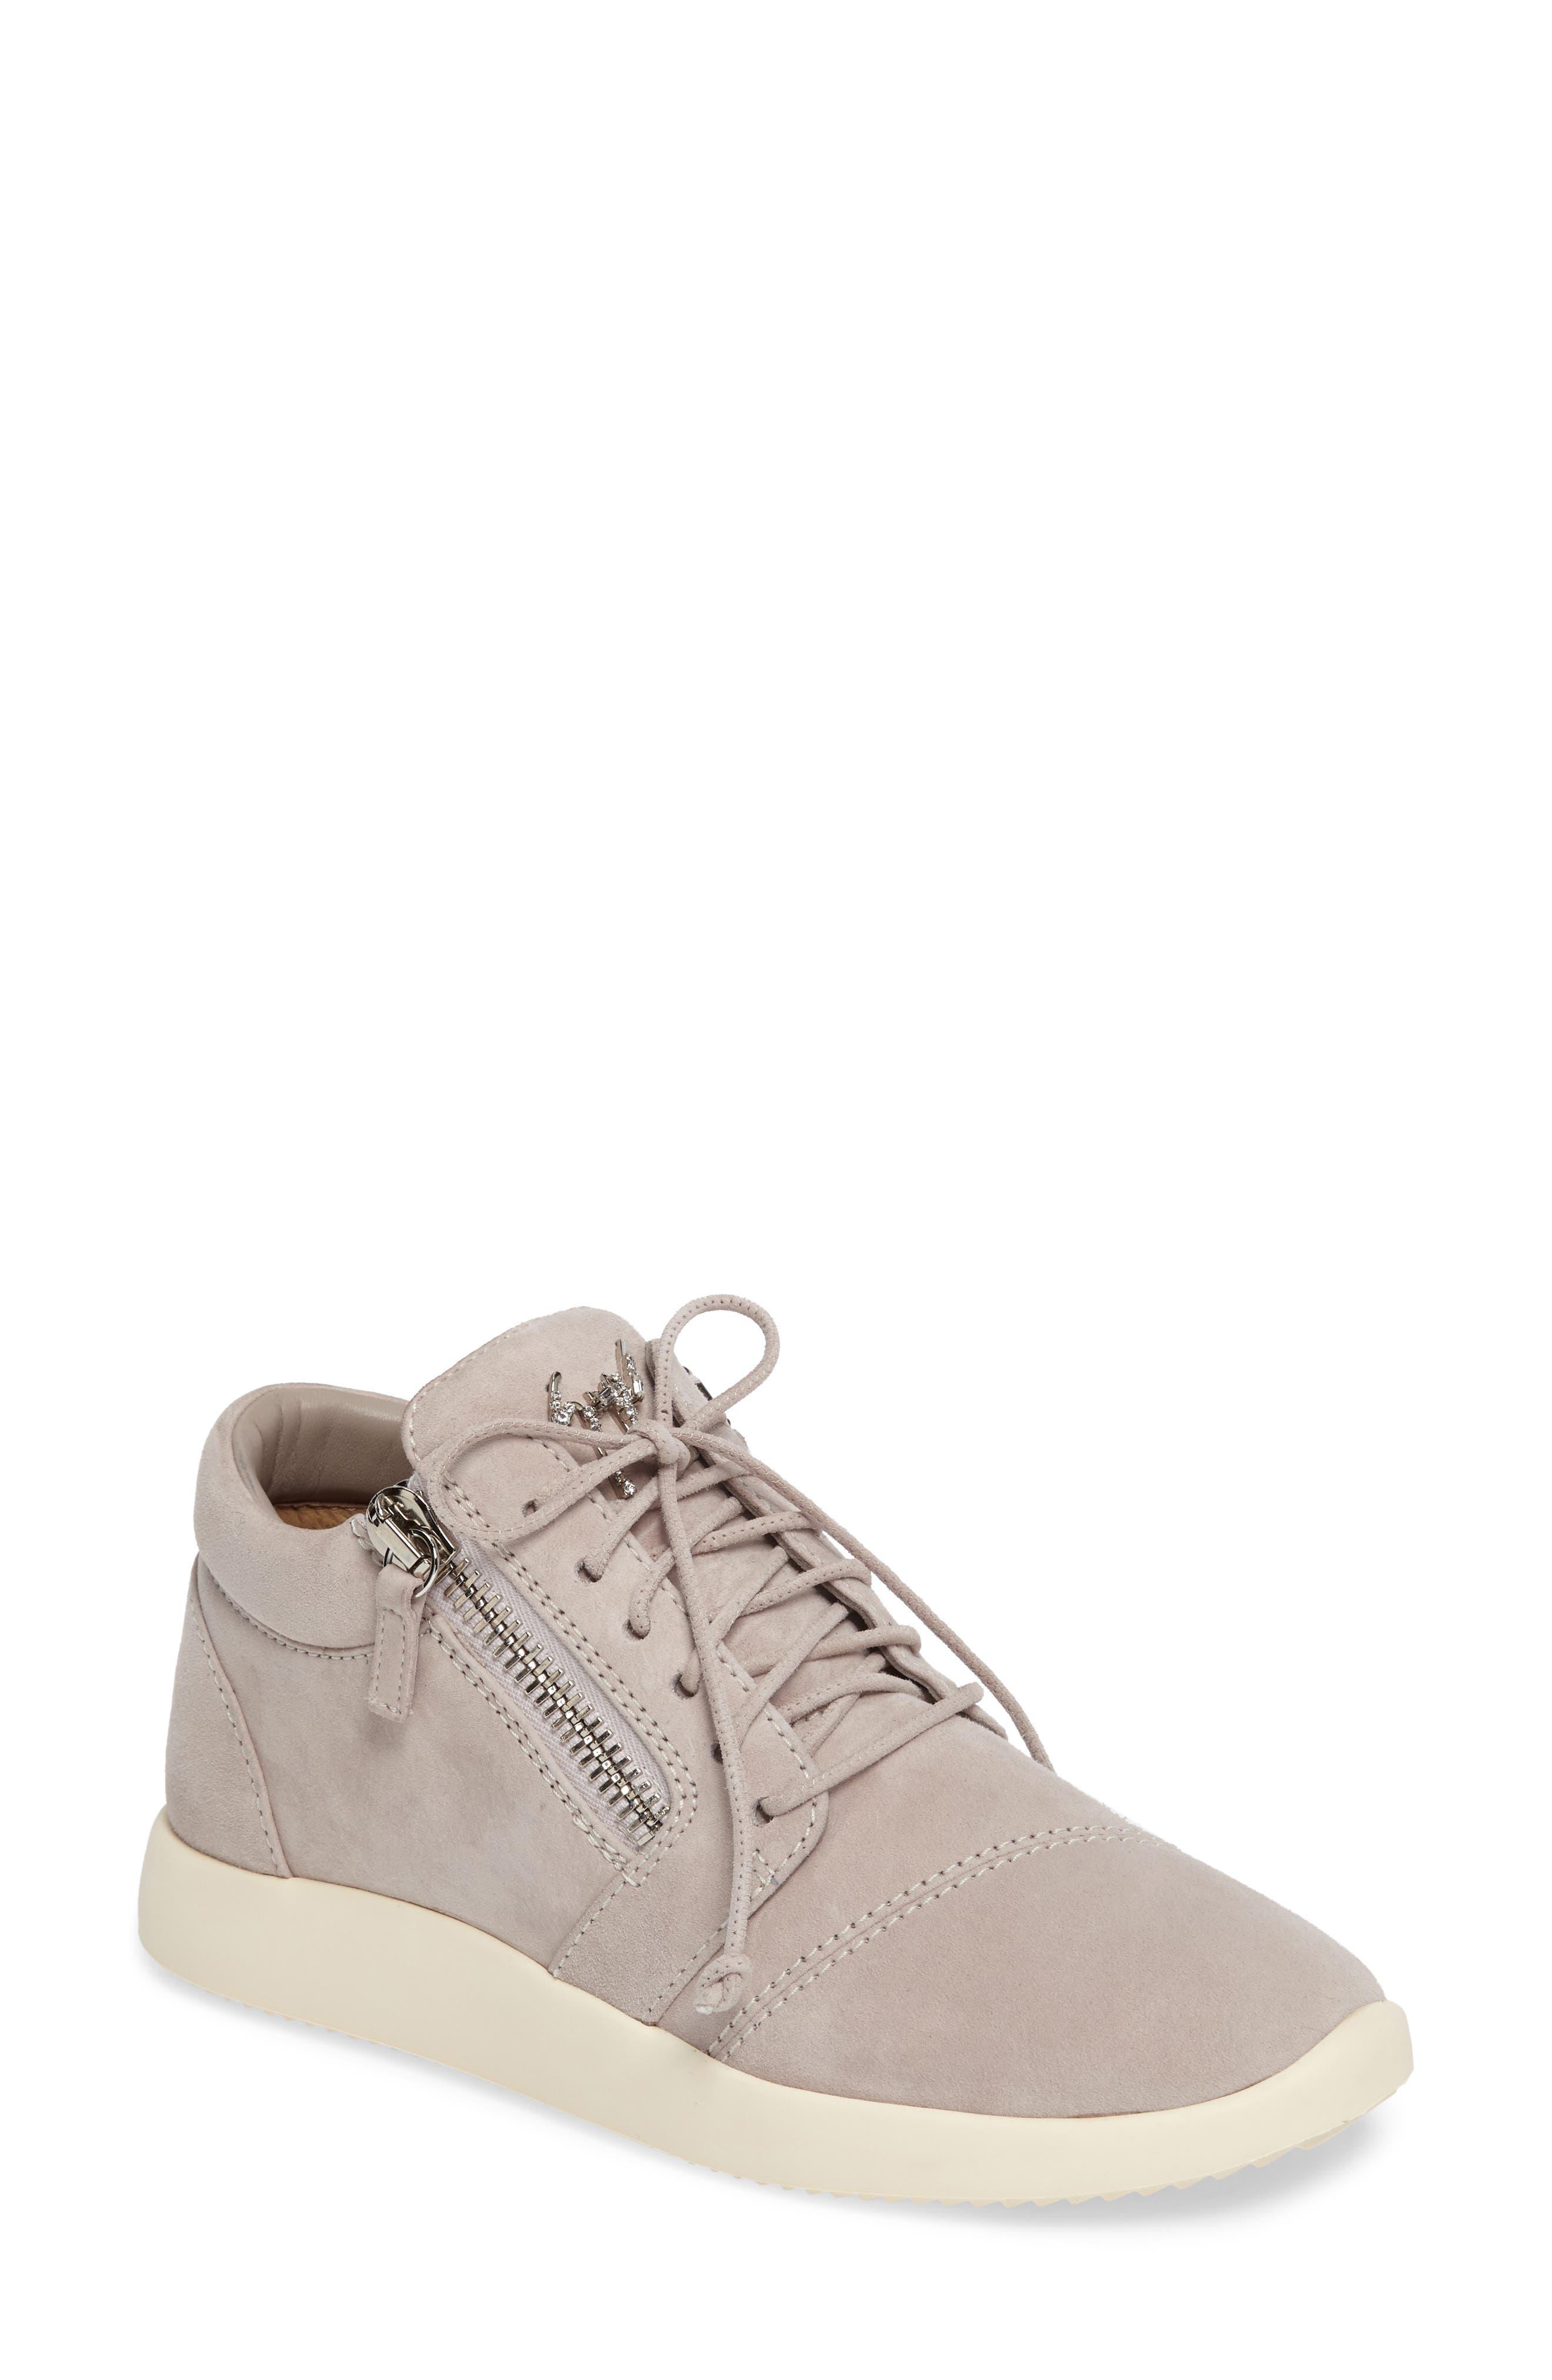 GIUSEPPE ZANOTTI Zip Mid-Top Sneaker